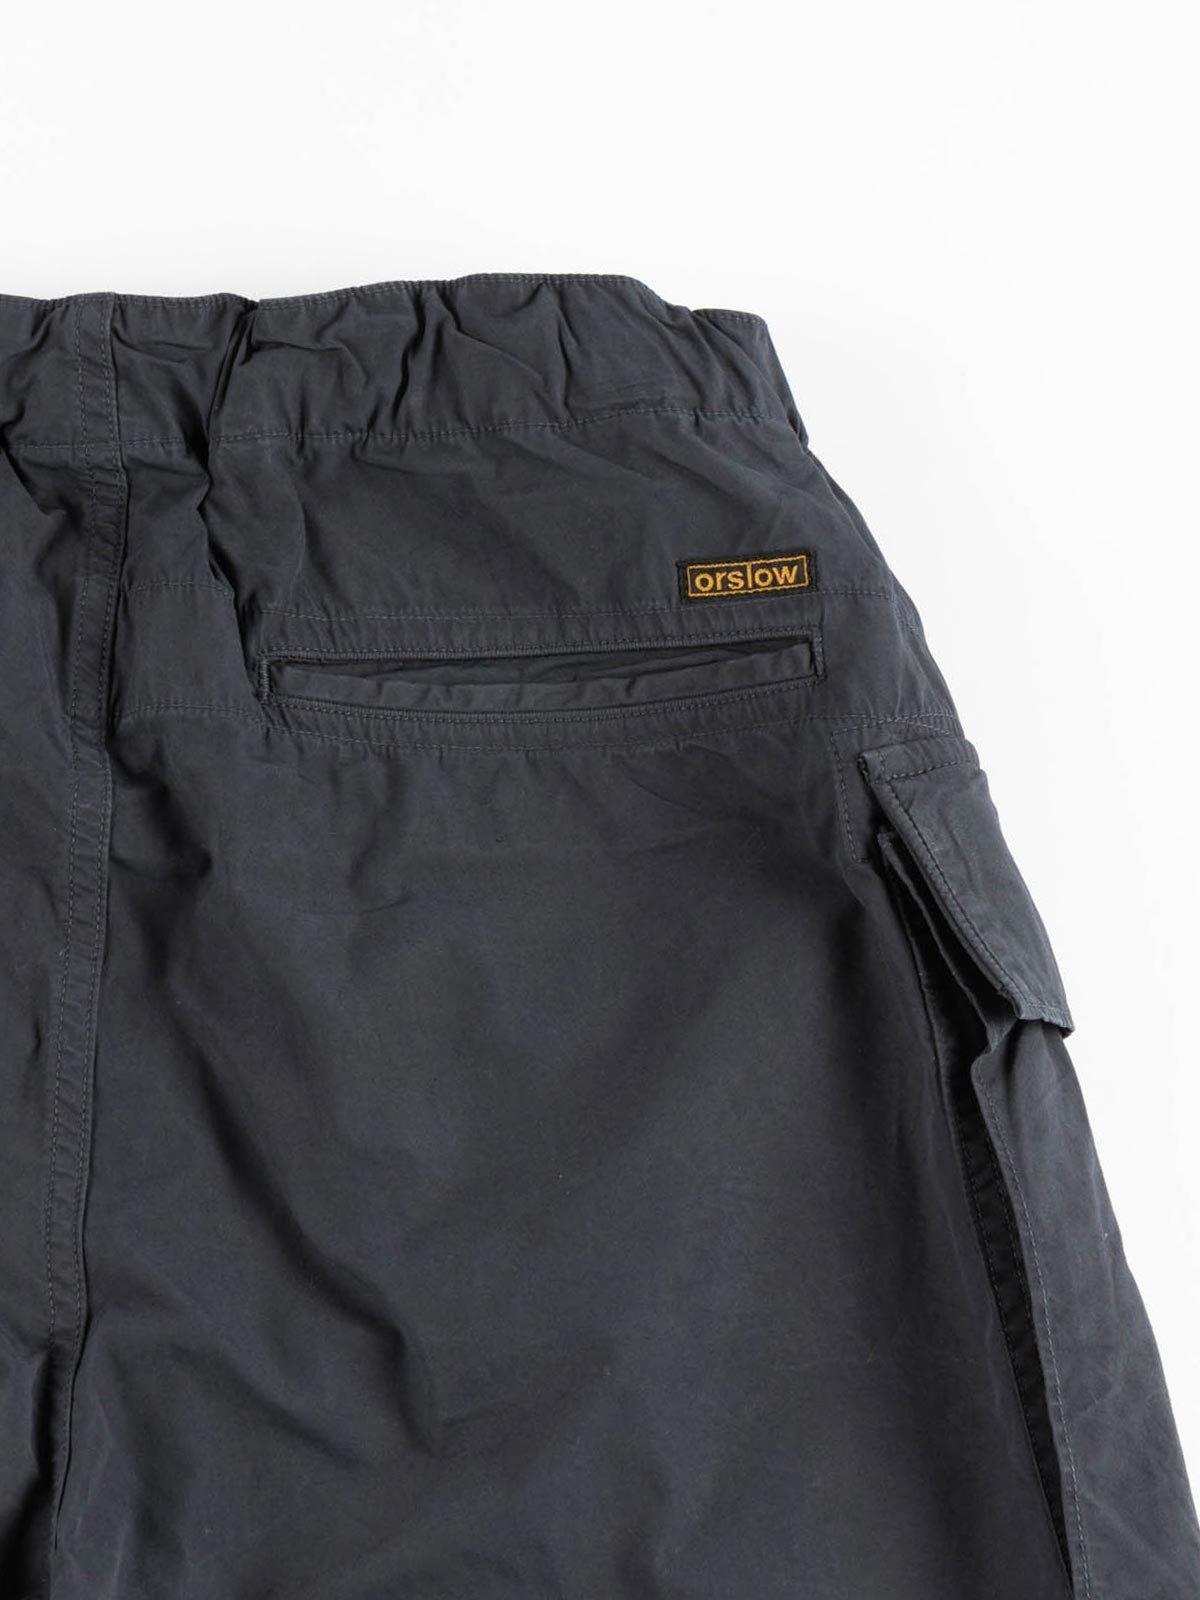 EASY CARGO SHORTS NAVY TYPEWRITER CLOTH - Image 4